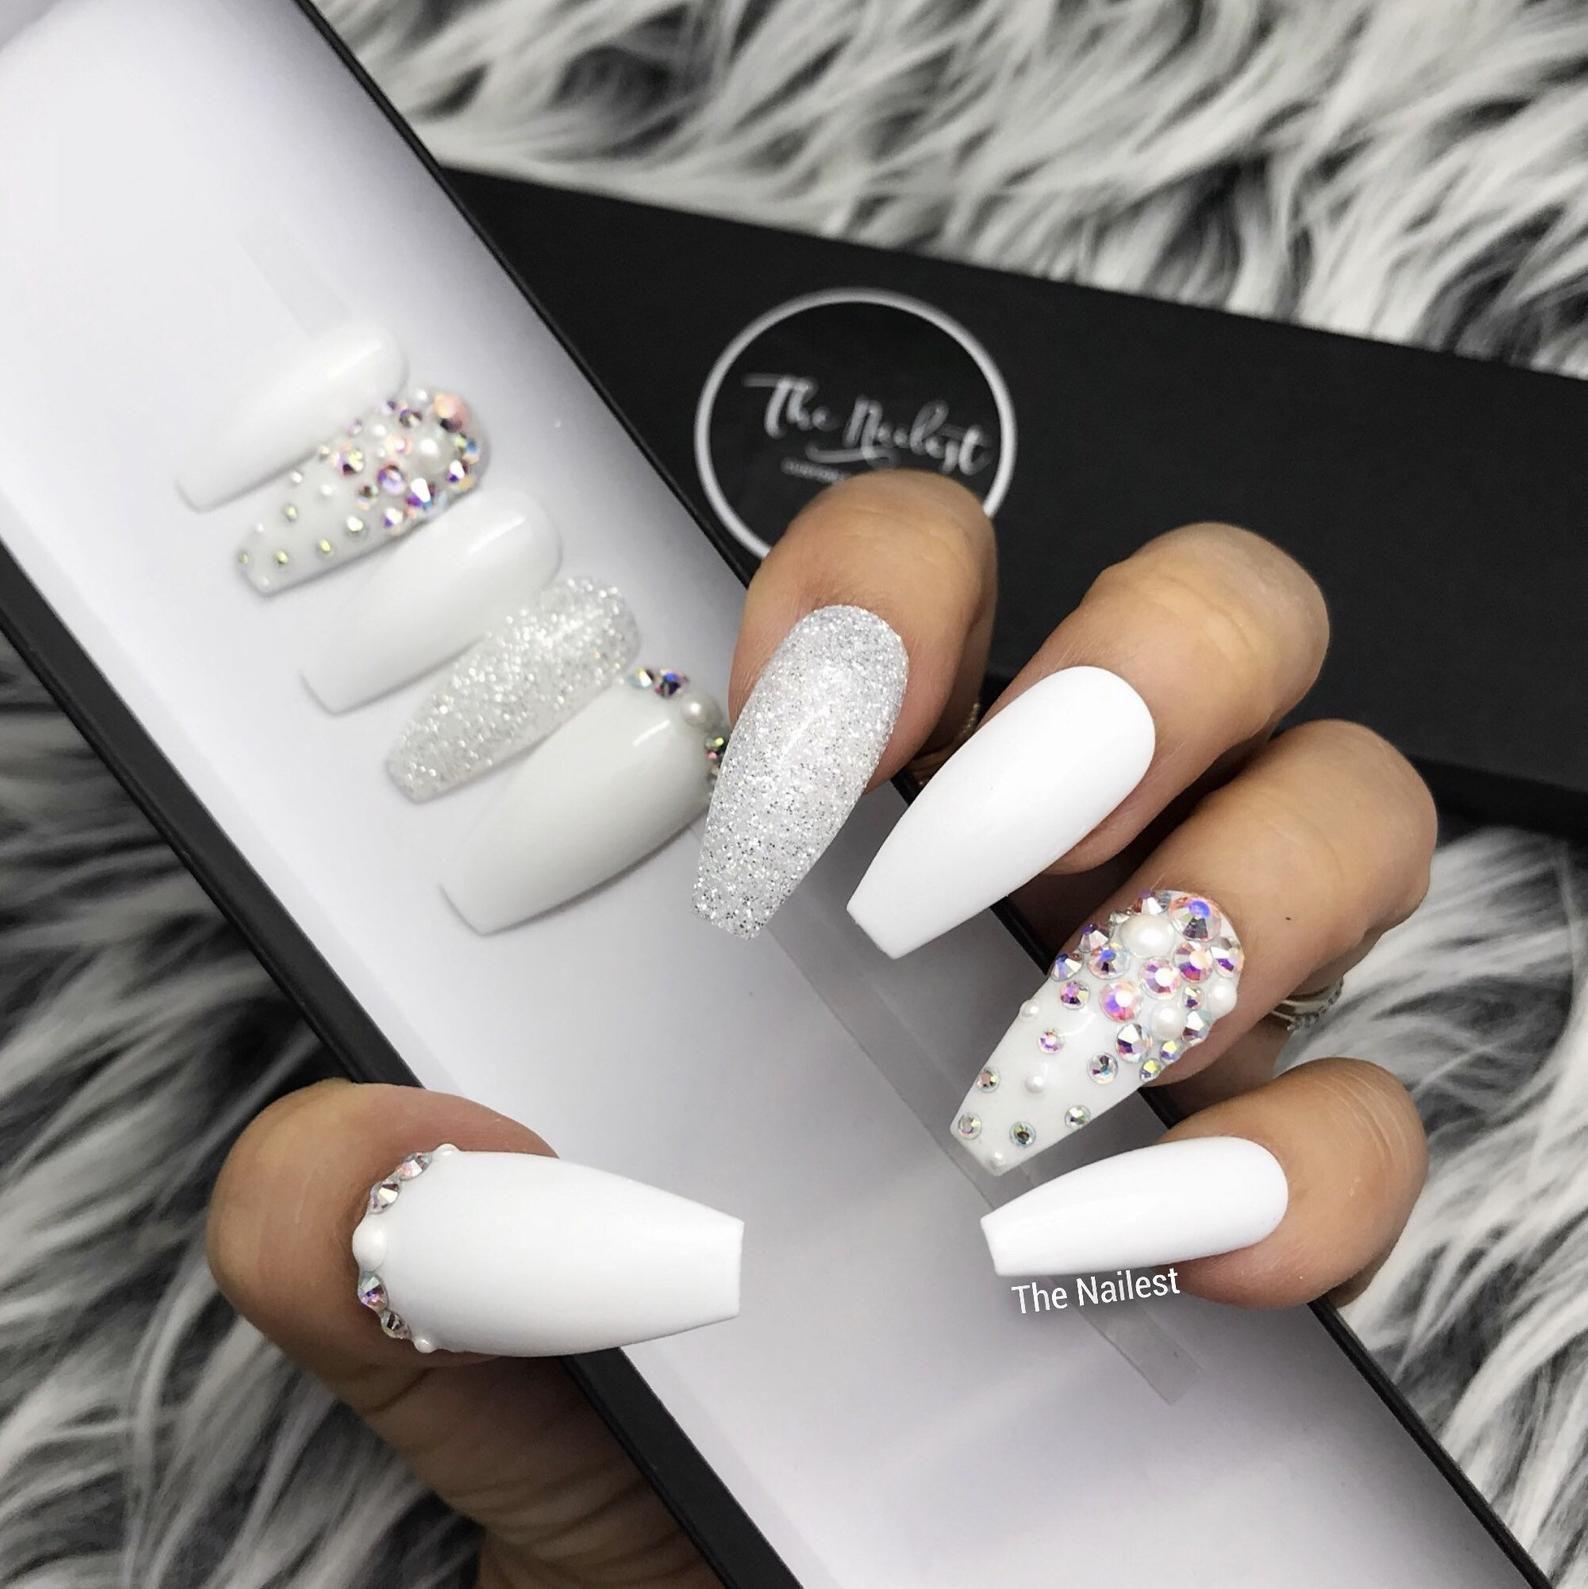 Glossy White Pearl Glitter Crystal Press On Nails Gothic Any Shape Fake Nails False Nails Glue On Nailes In 2020 Pearl Nails Prom Nails White Acrylic Nails